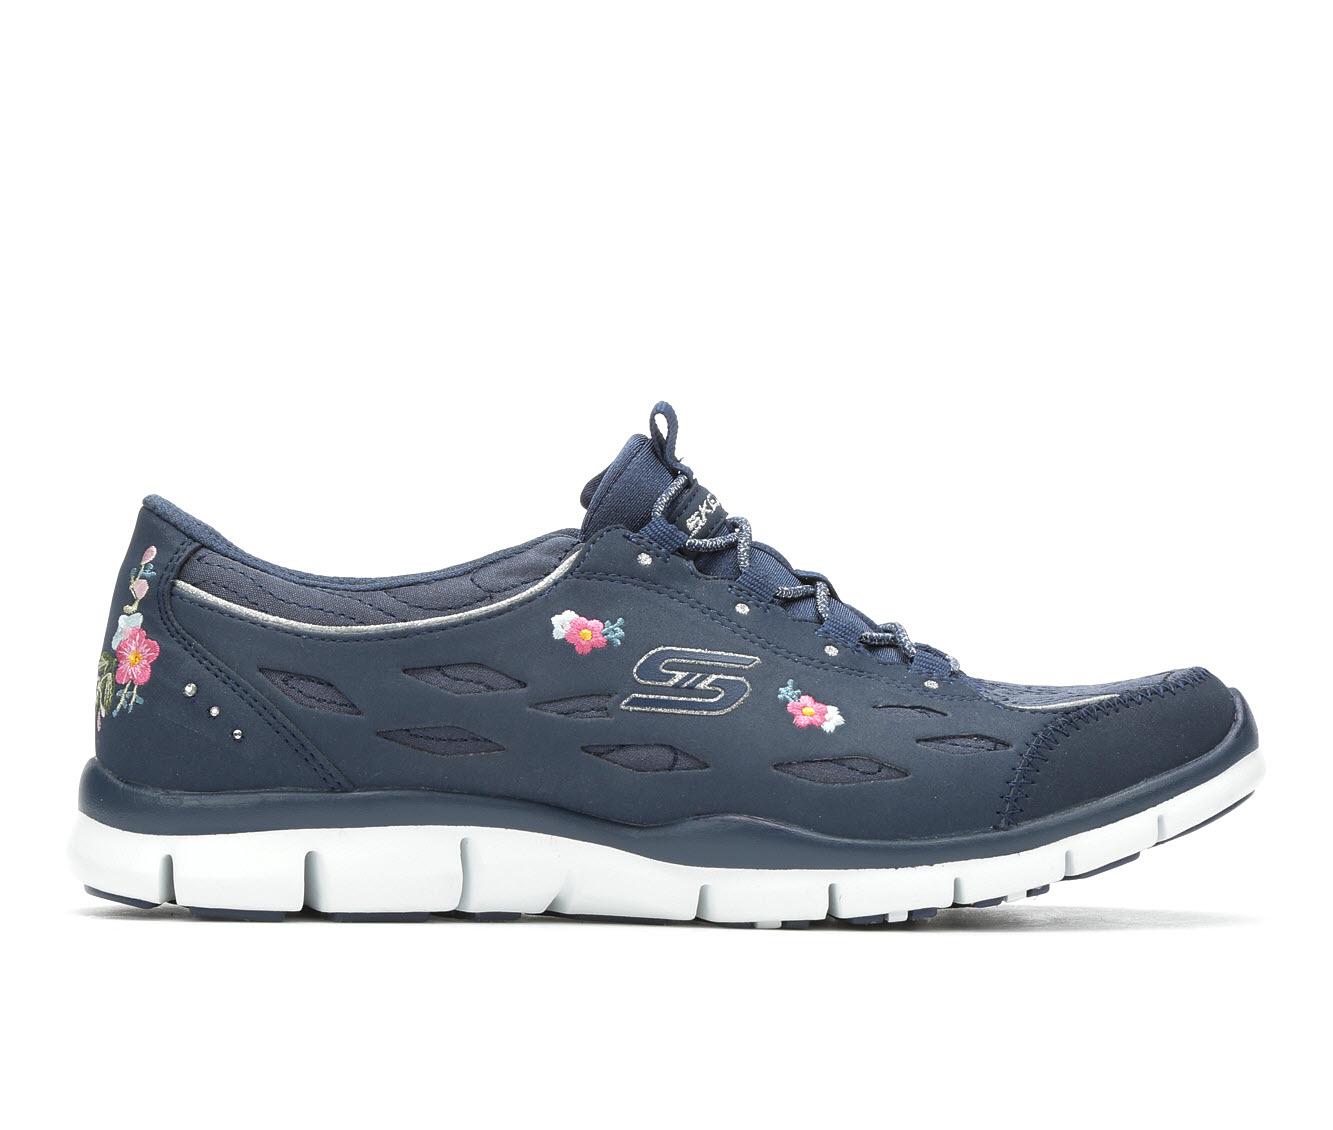 Skechers Divine Bloom 23775 Women's Athletic Shoe (Blue)